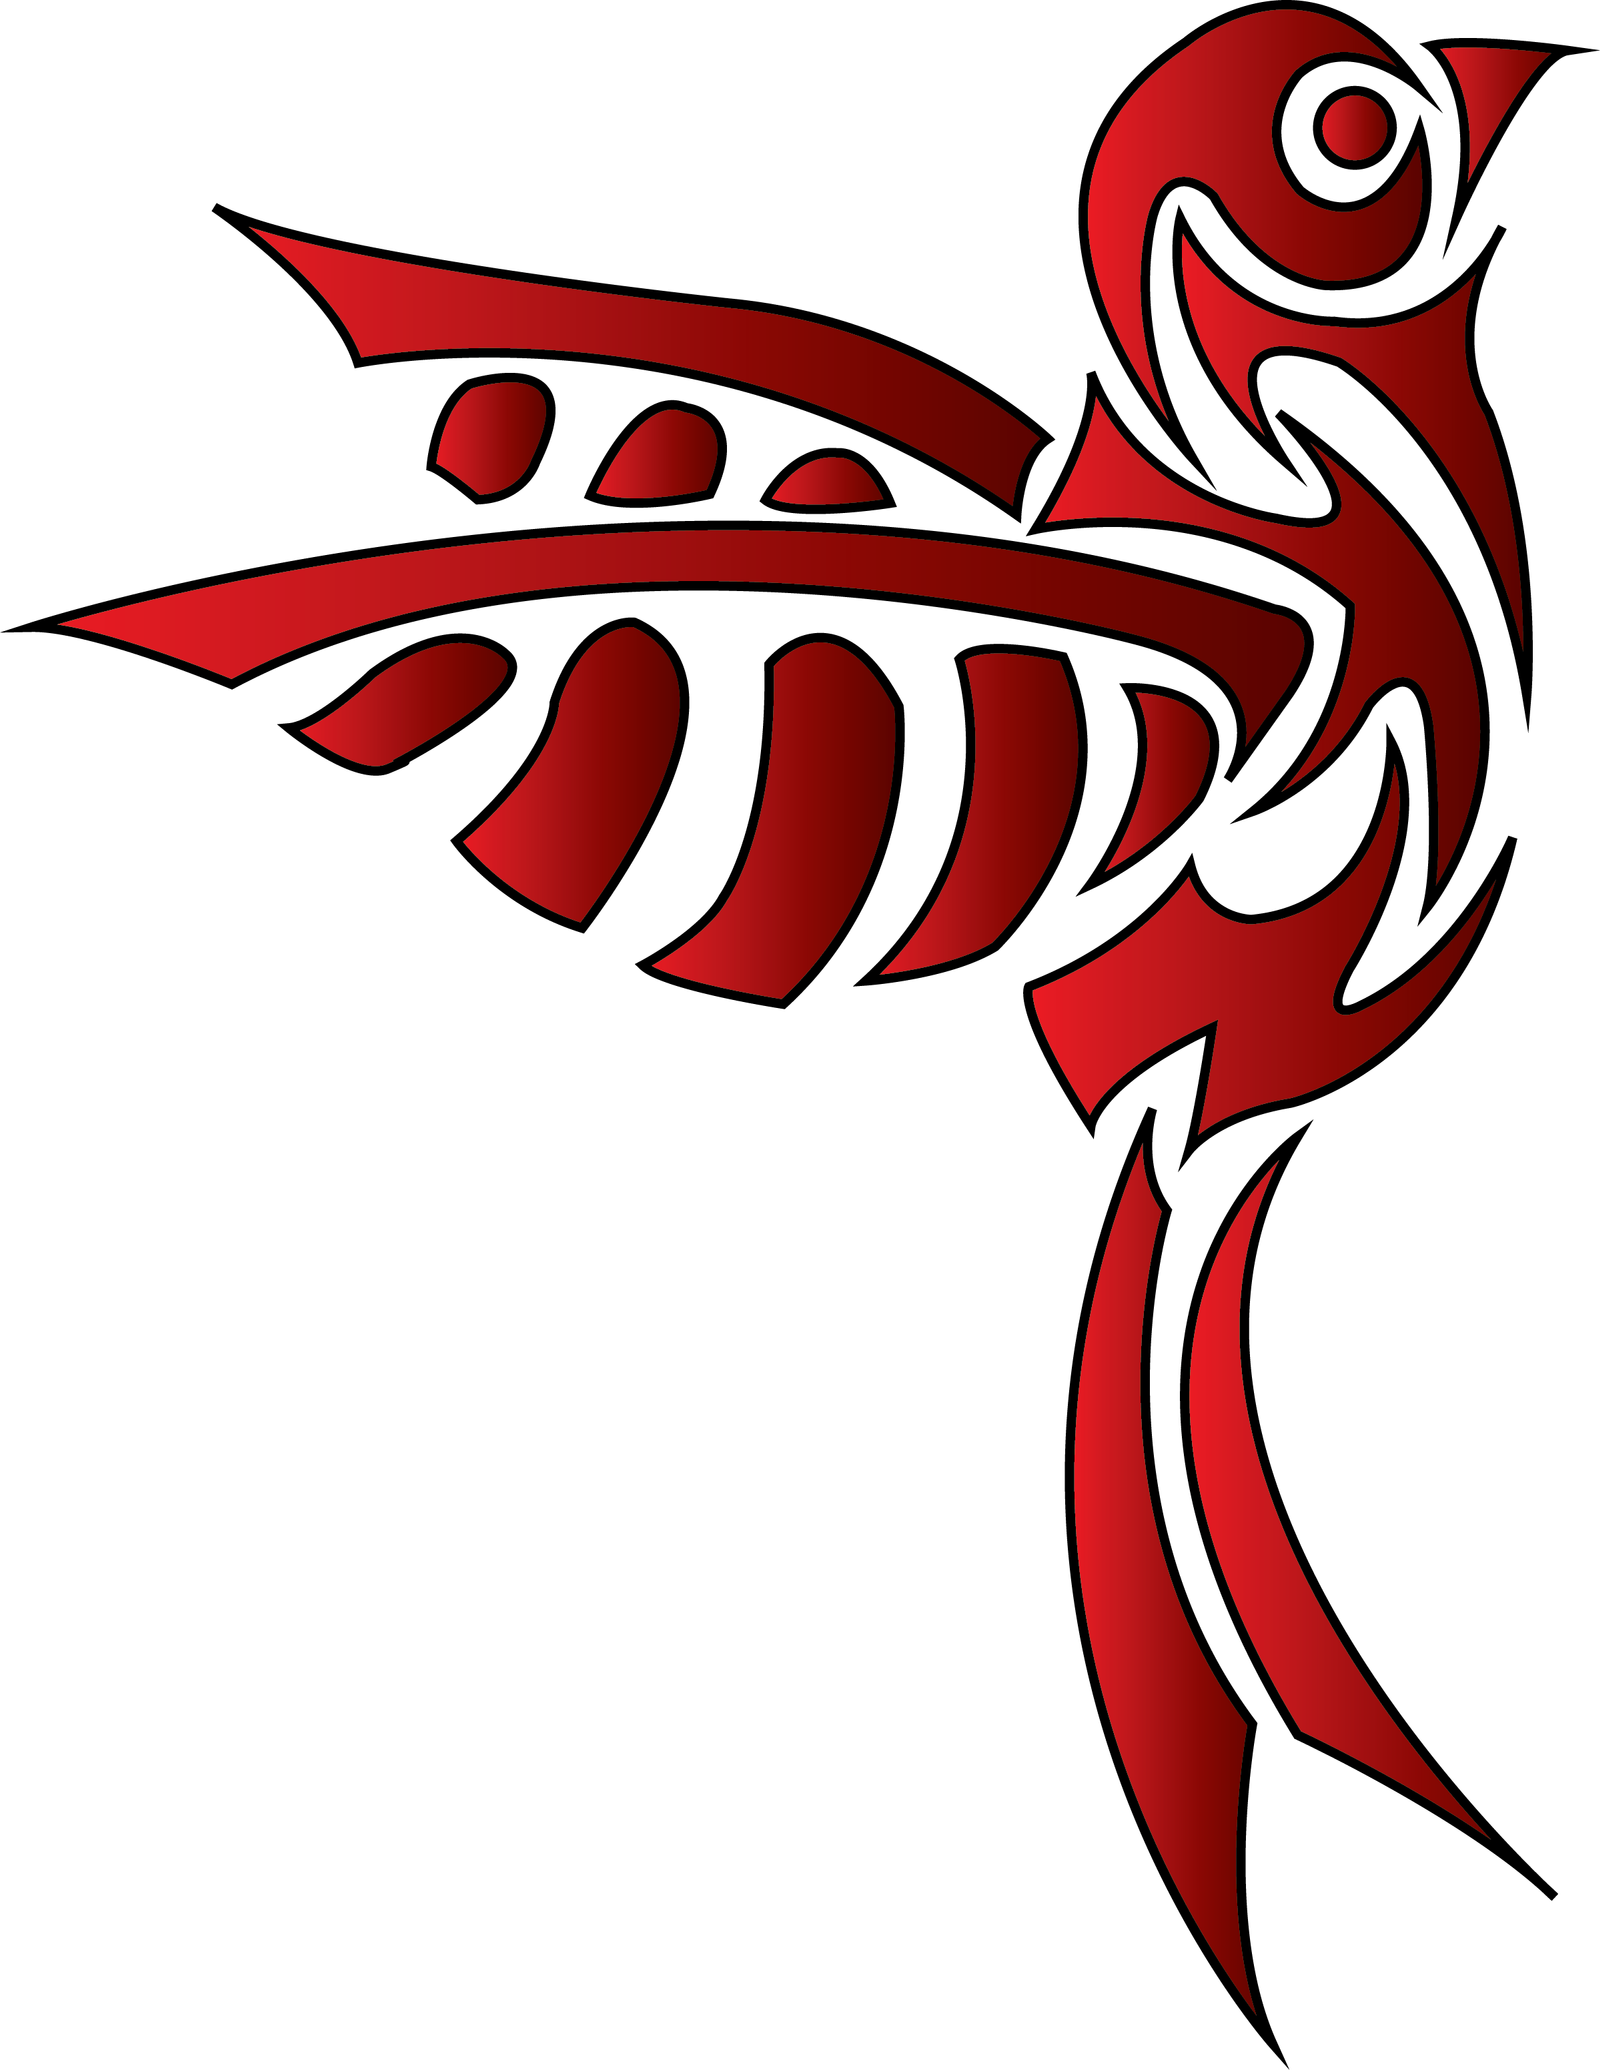 tribal bird tattoo by b southern on deviantart. Black Bedroom Furniture Sets. Home Design Ideas